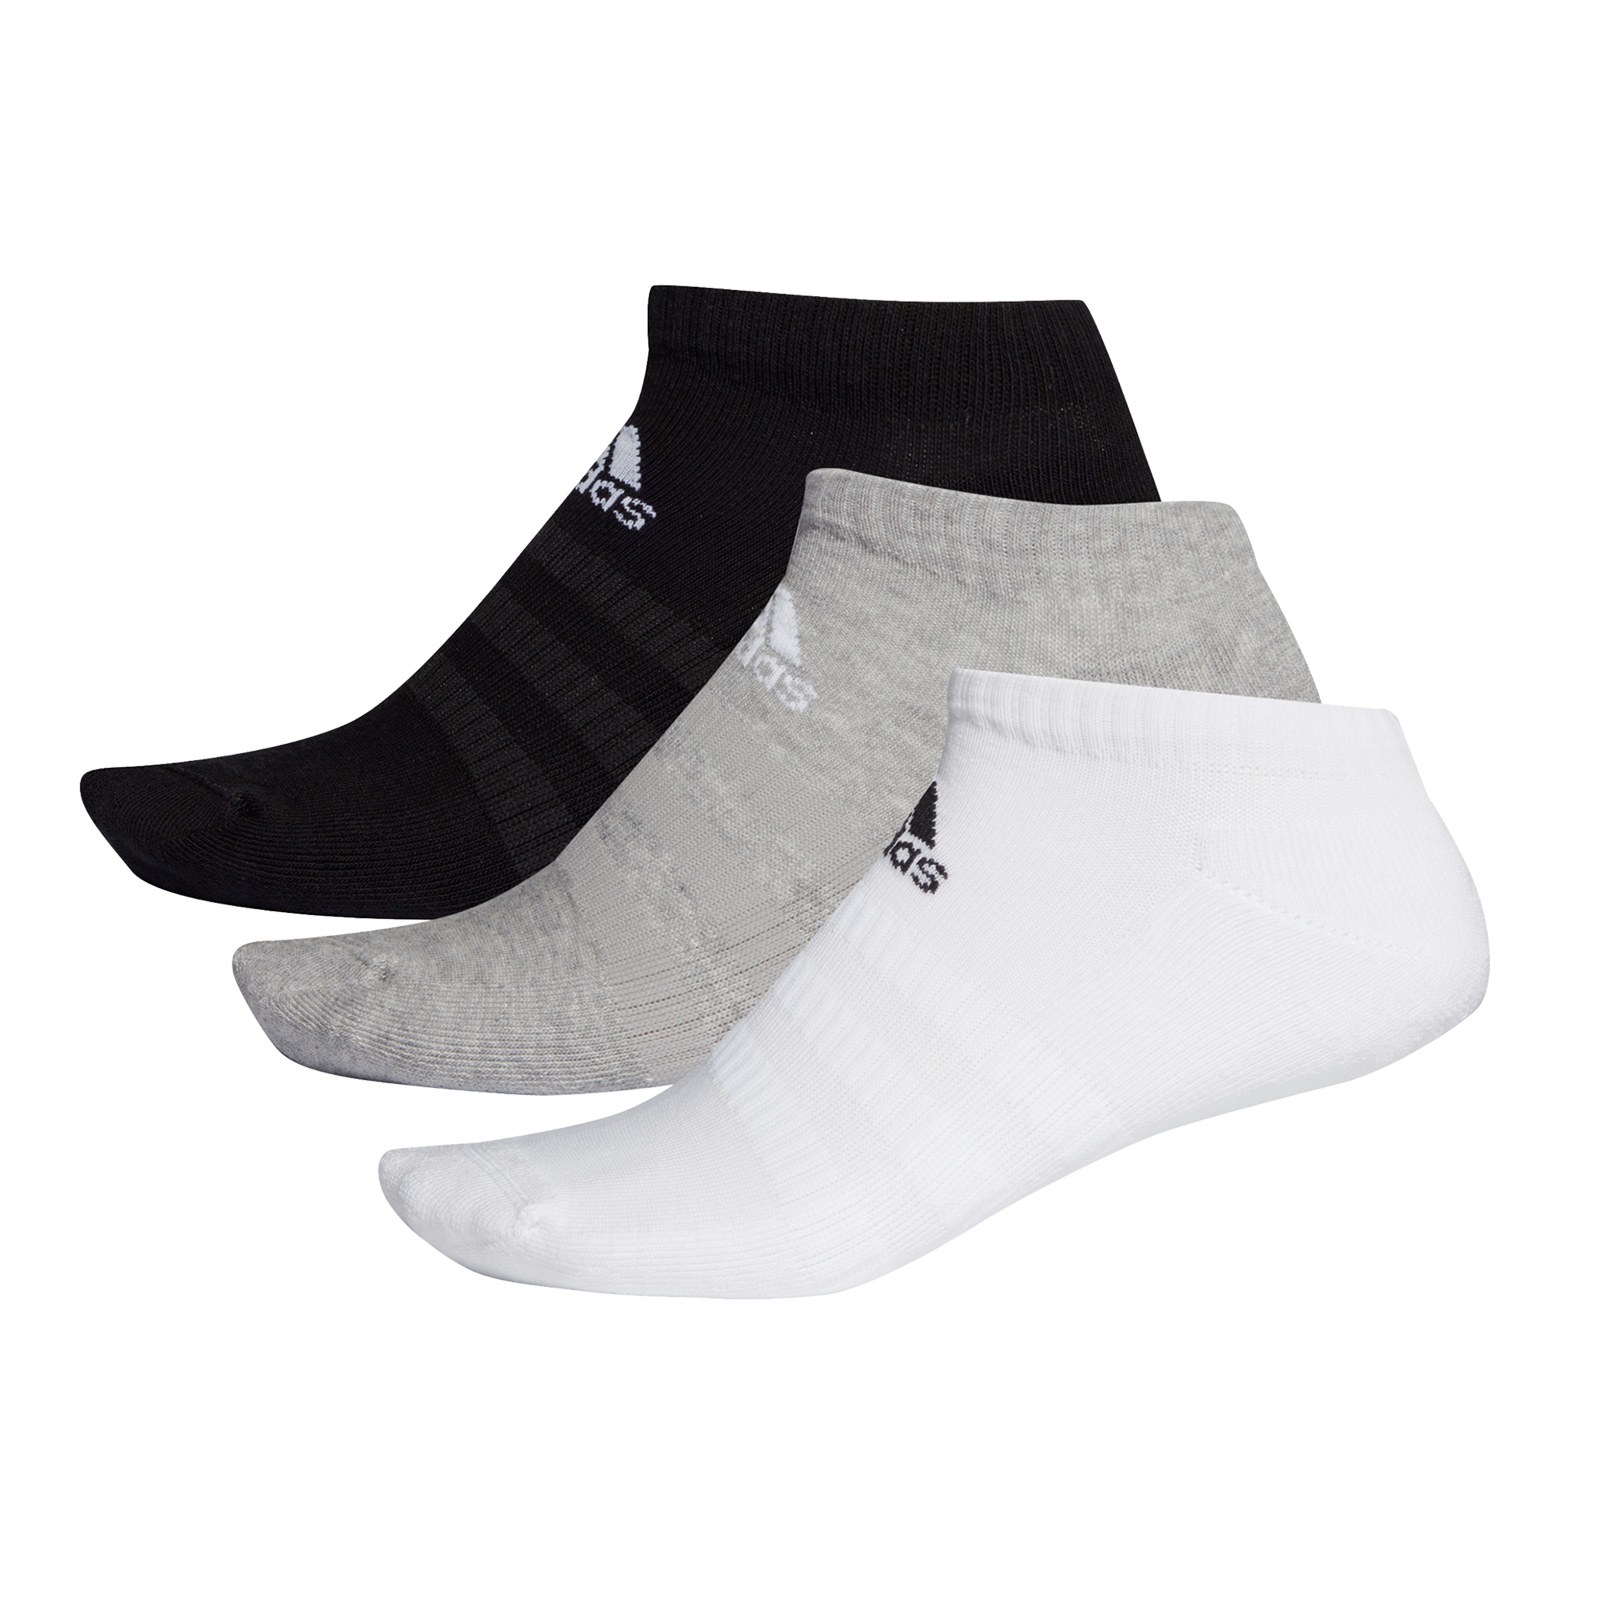 adidas - CUSH LOW 3PP - MGREYH/WHITE/BLACK